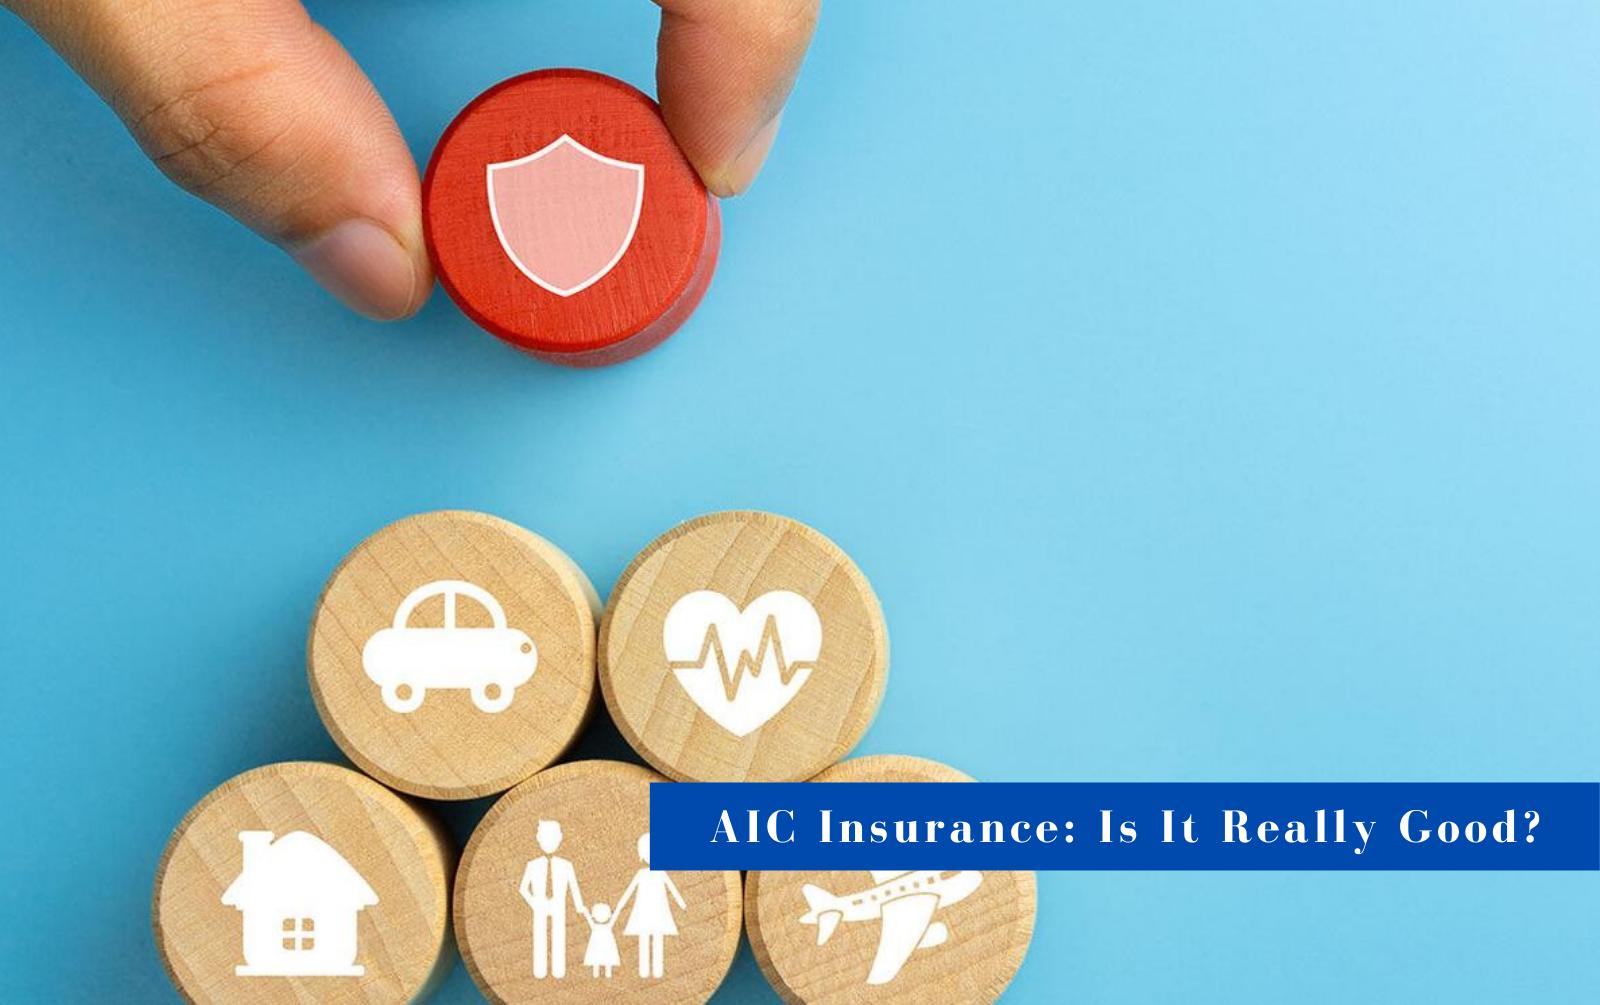 AIC Insurance